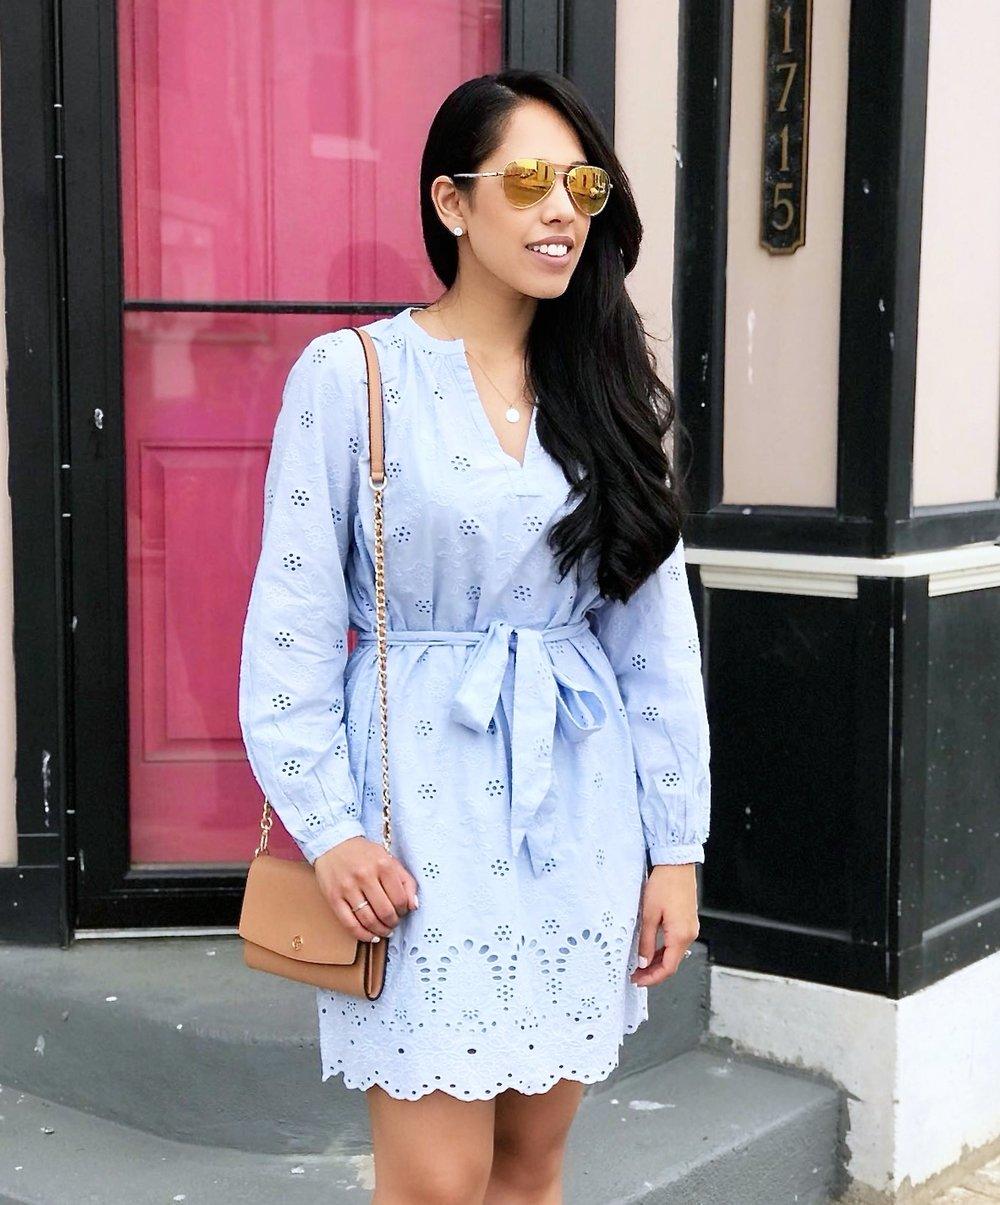 philadelphia-fashion-blogger-summer-fashion.JPG